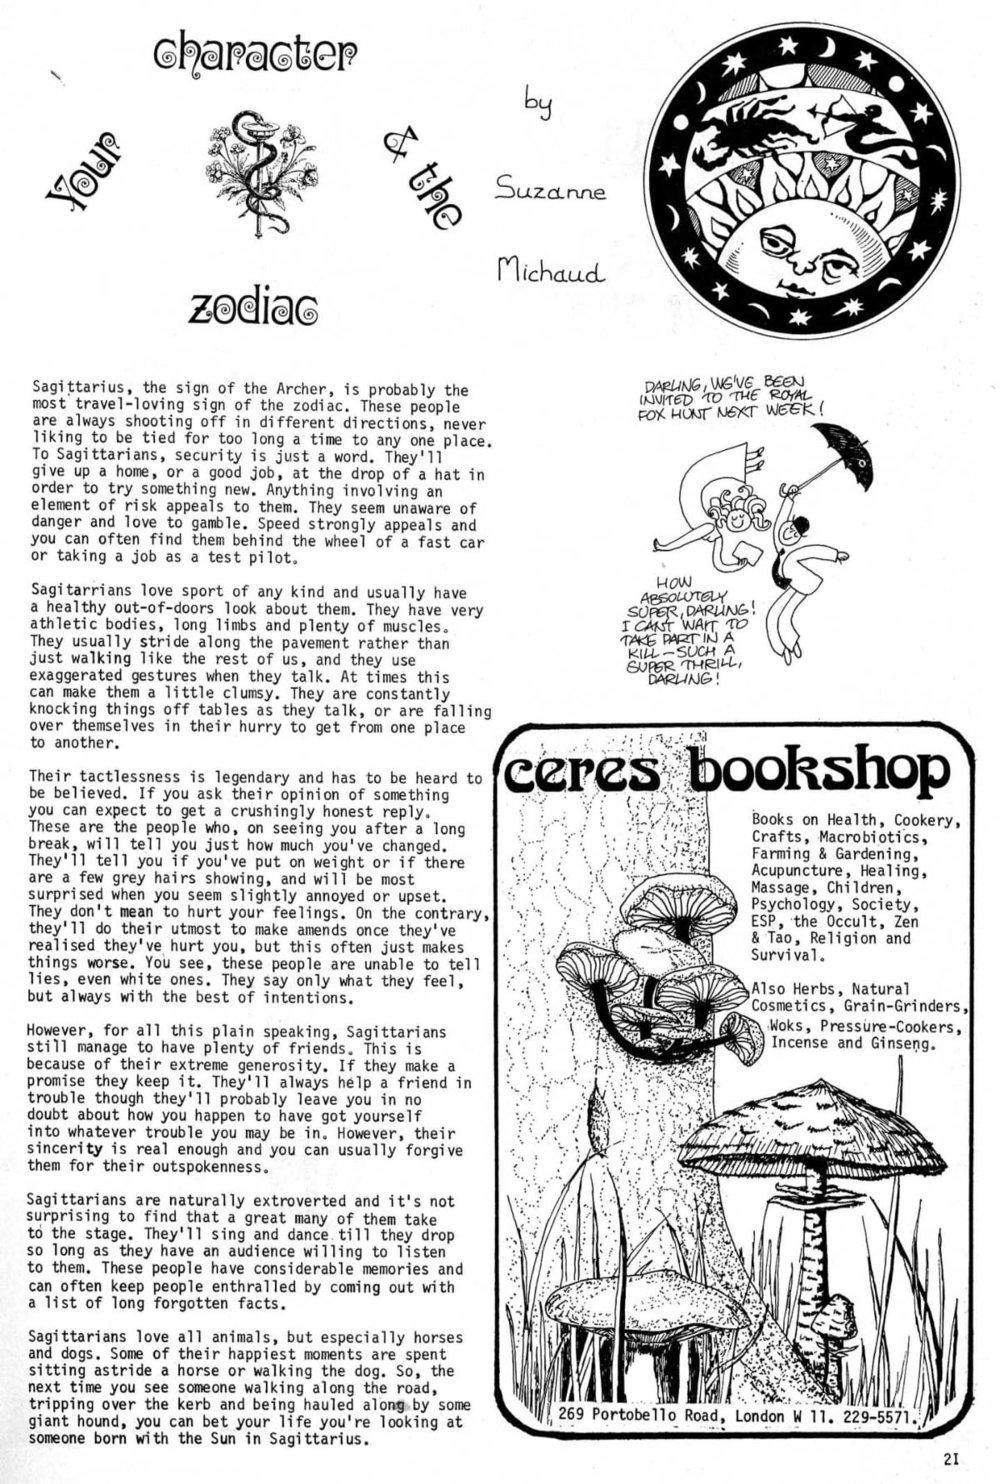 seed-v4-n1-jan1975-21.jpg